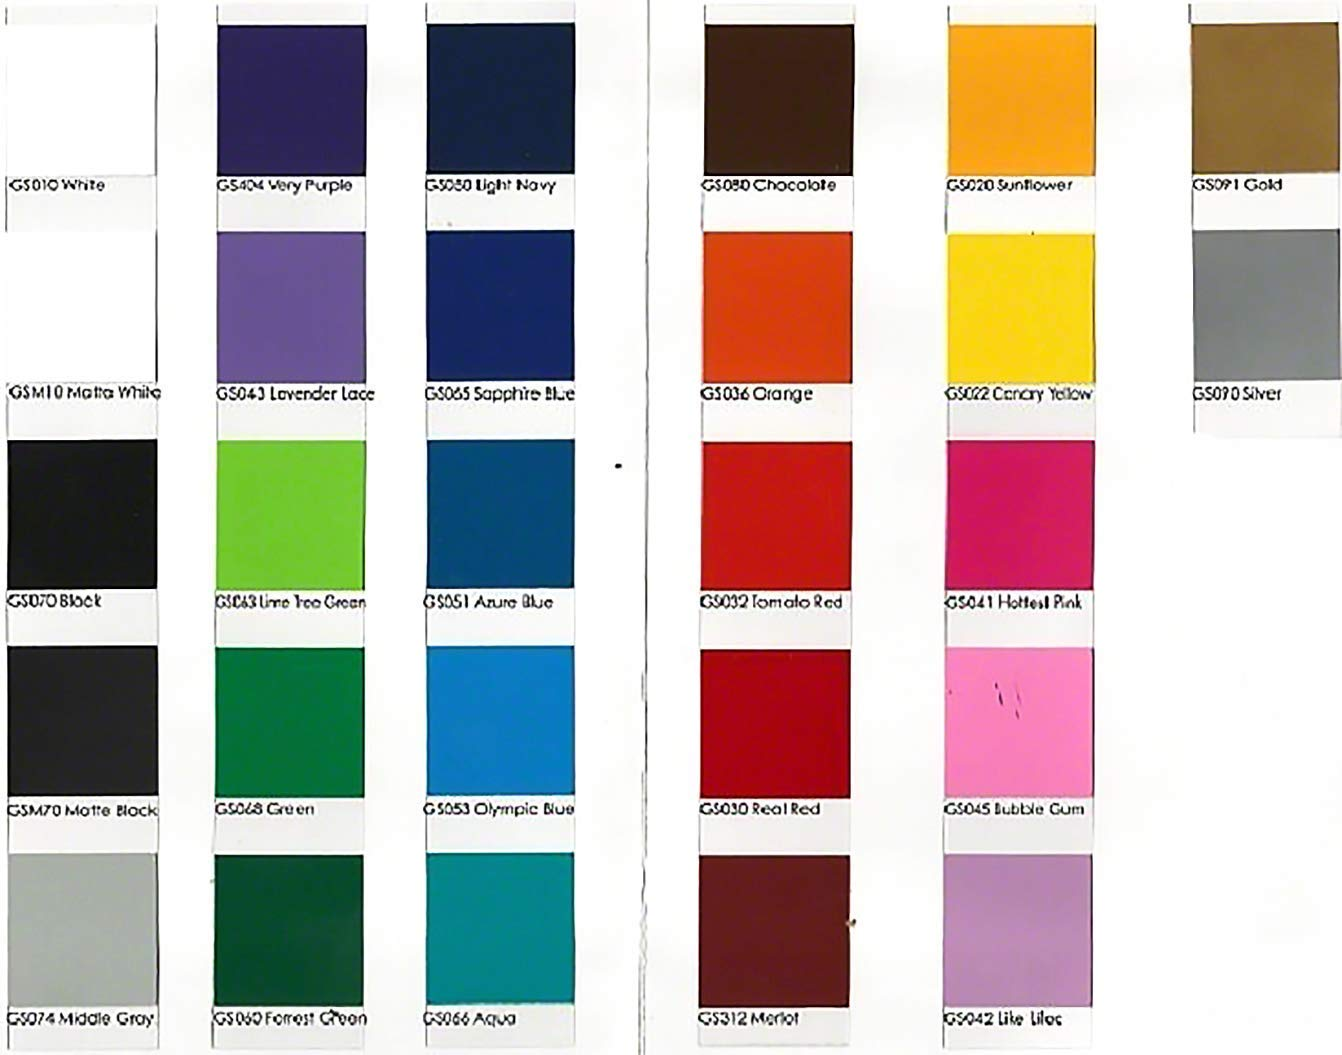 Color Sapphire Blue Got Rice Burner Man Funny JDM Car Truck Window Wall Laptop Vinyl Decal Sticker. ShopForAllYou Stickers /& Decals